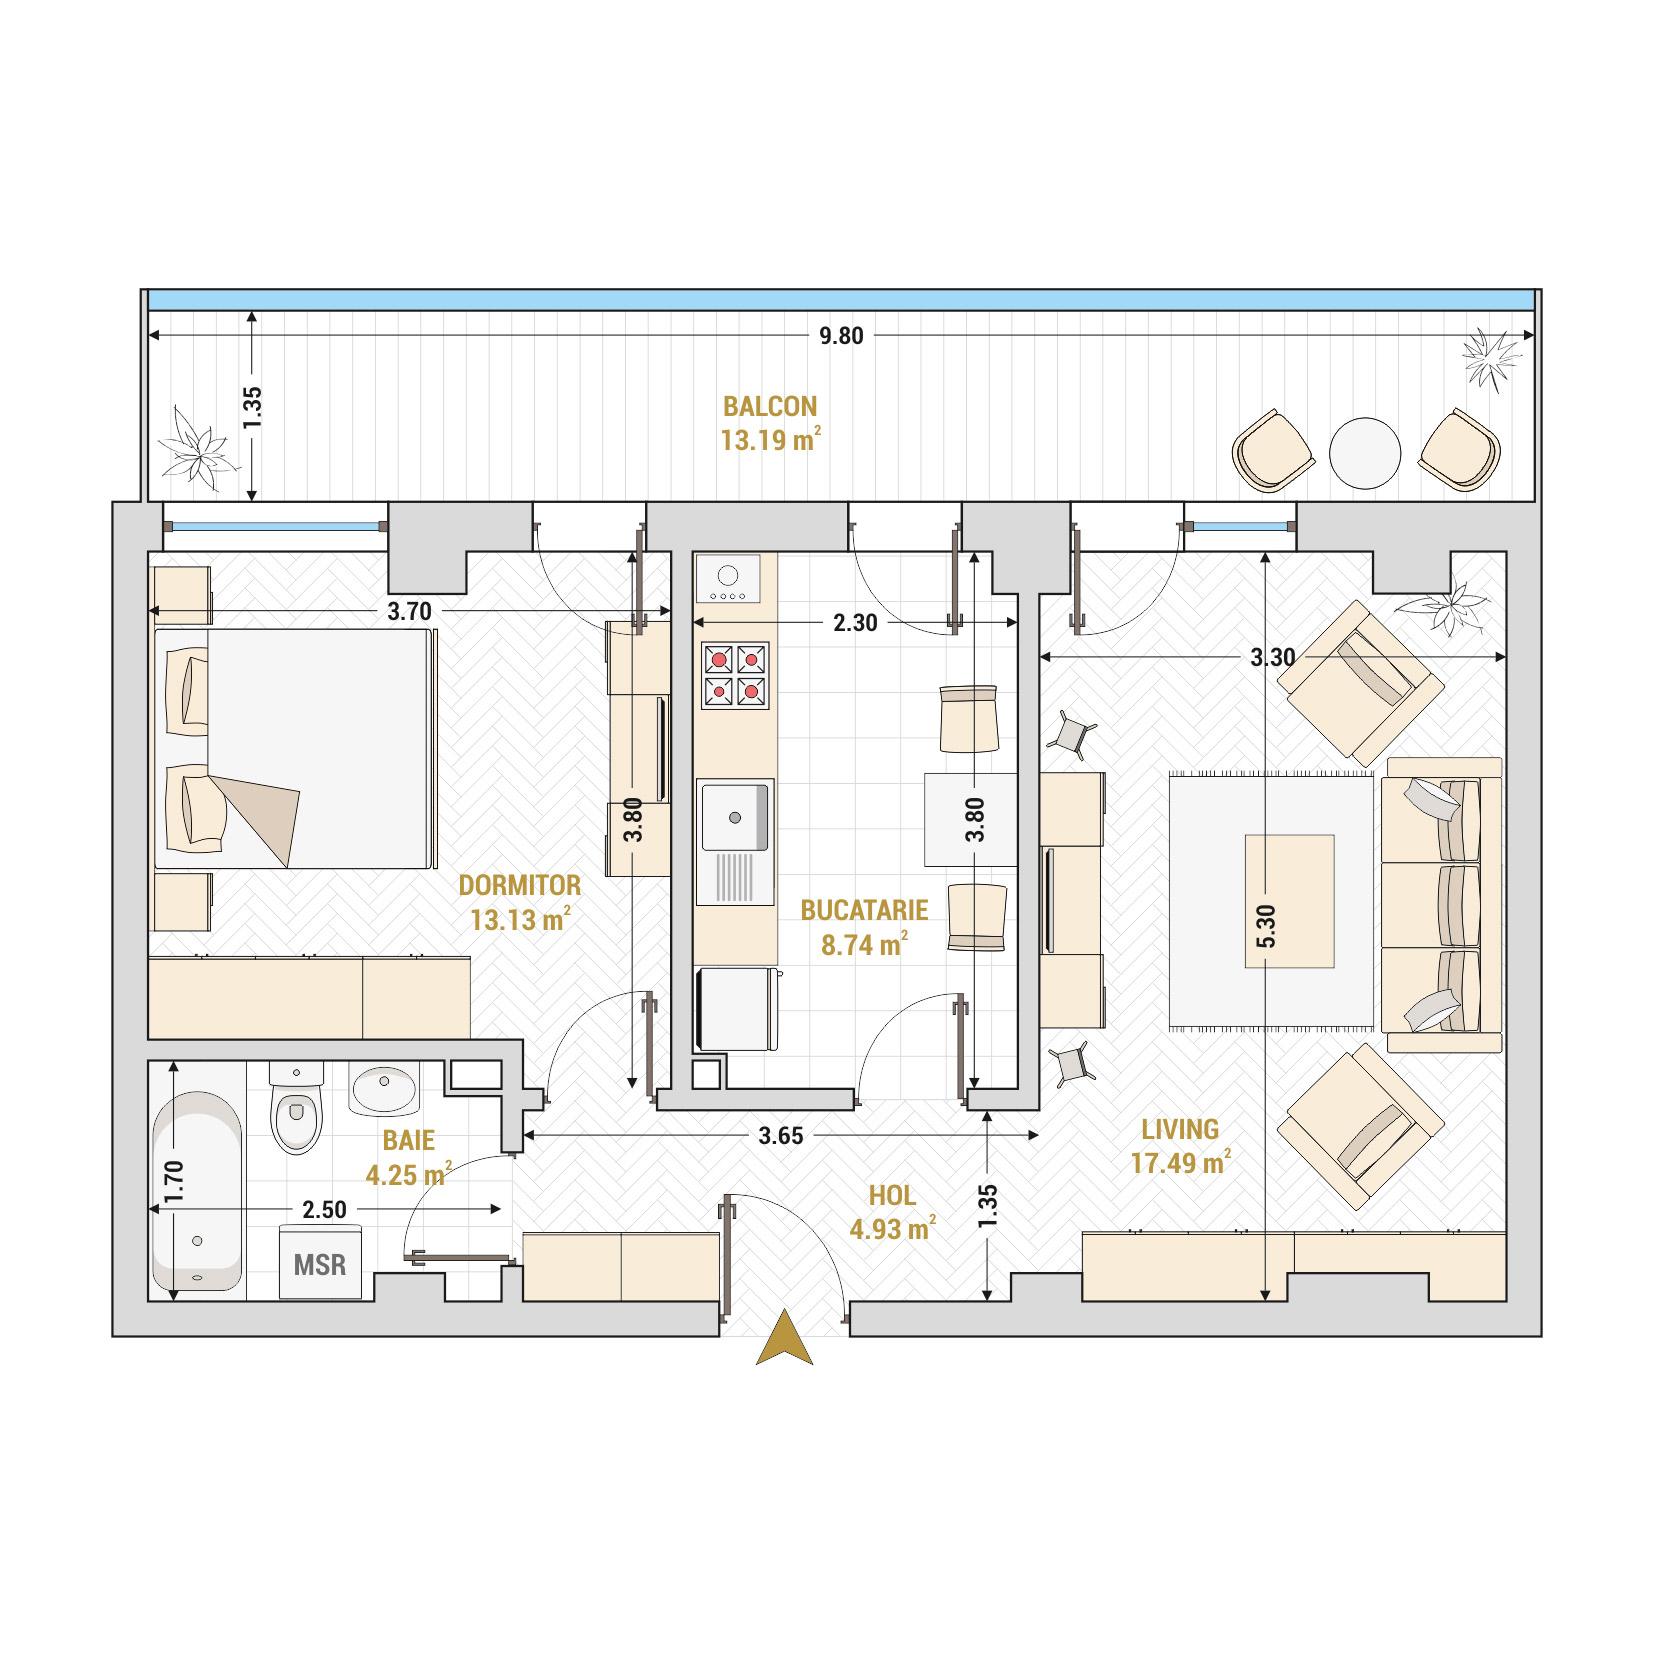 Apartament 2 camere de vanzare Bucuresti - Catedral Residence - Marriott, Piata Unirii, 13 Septembrie, Izvor - Tip 2 - T2A